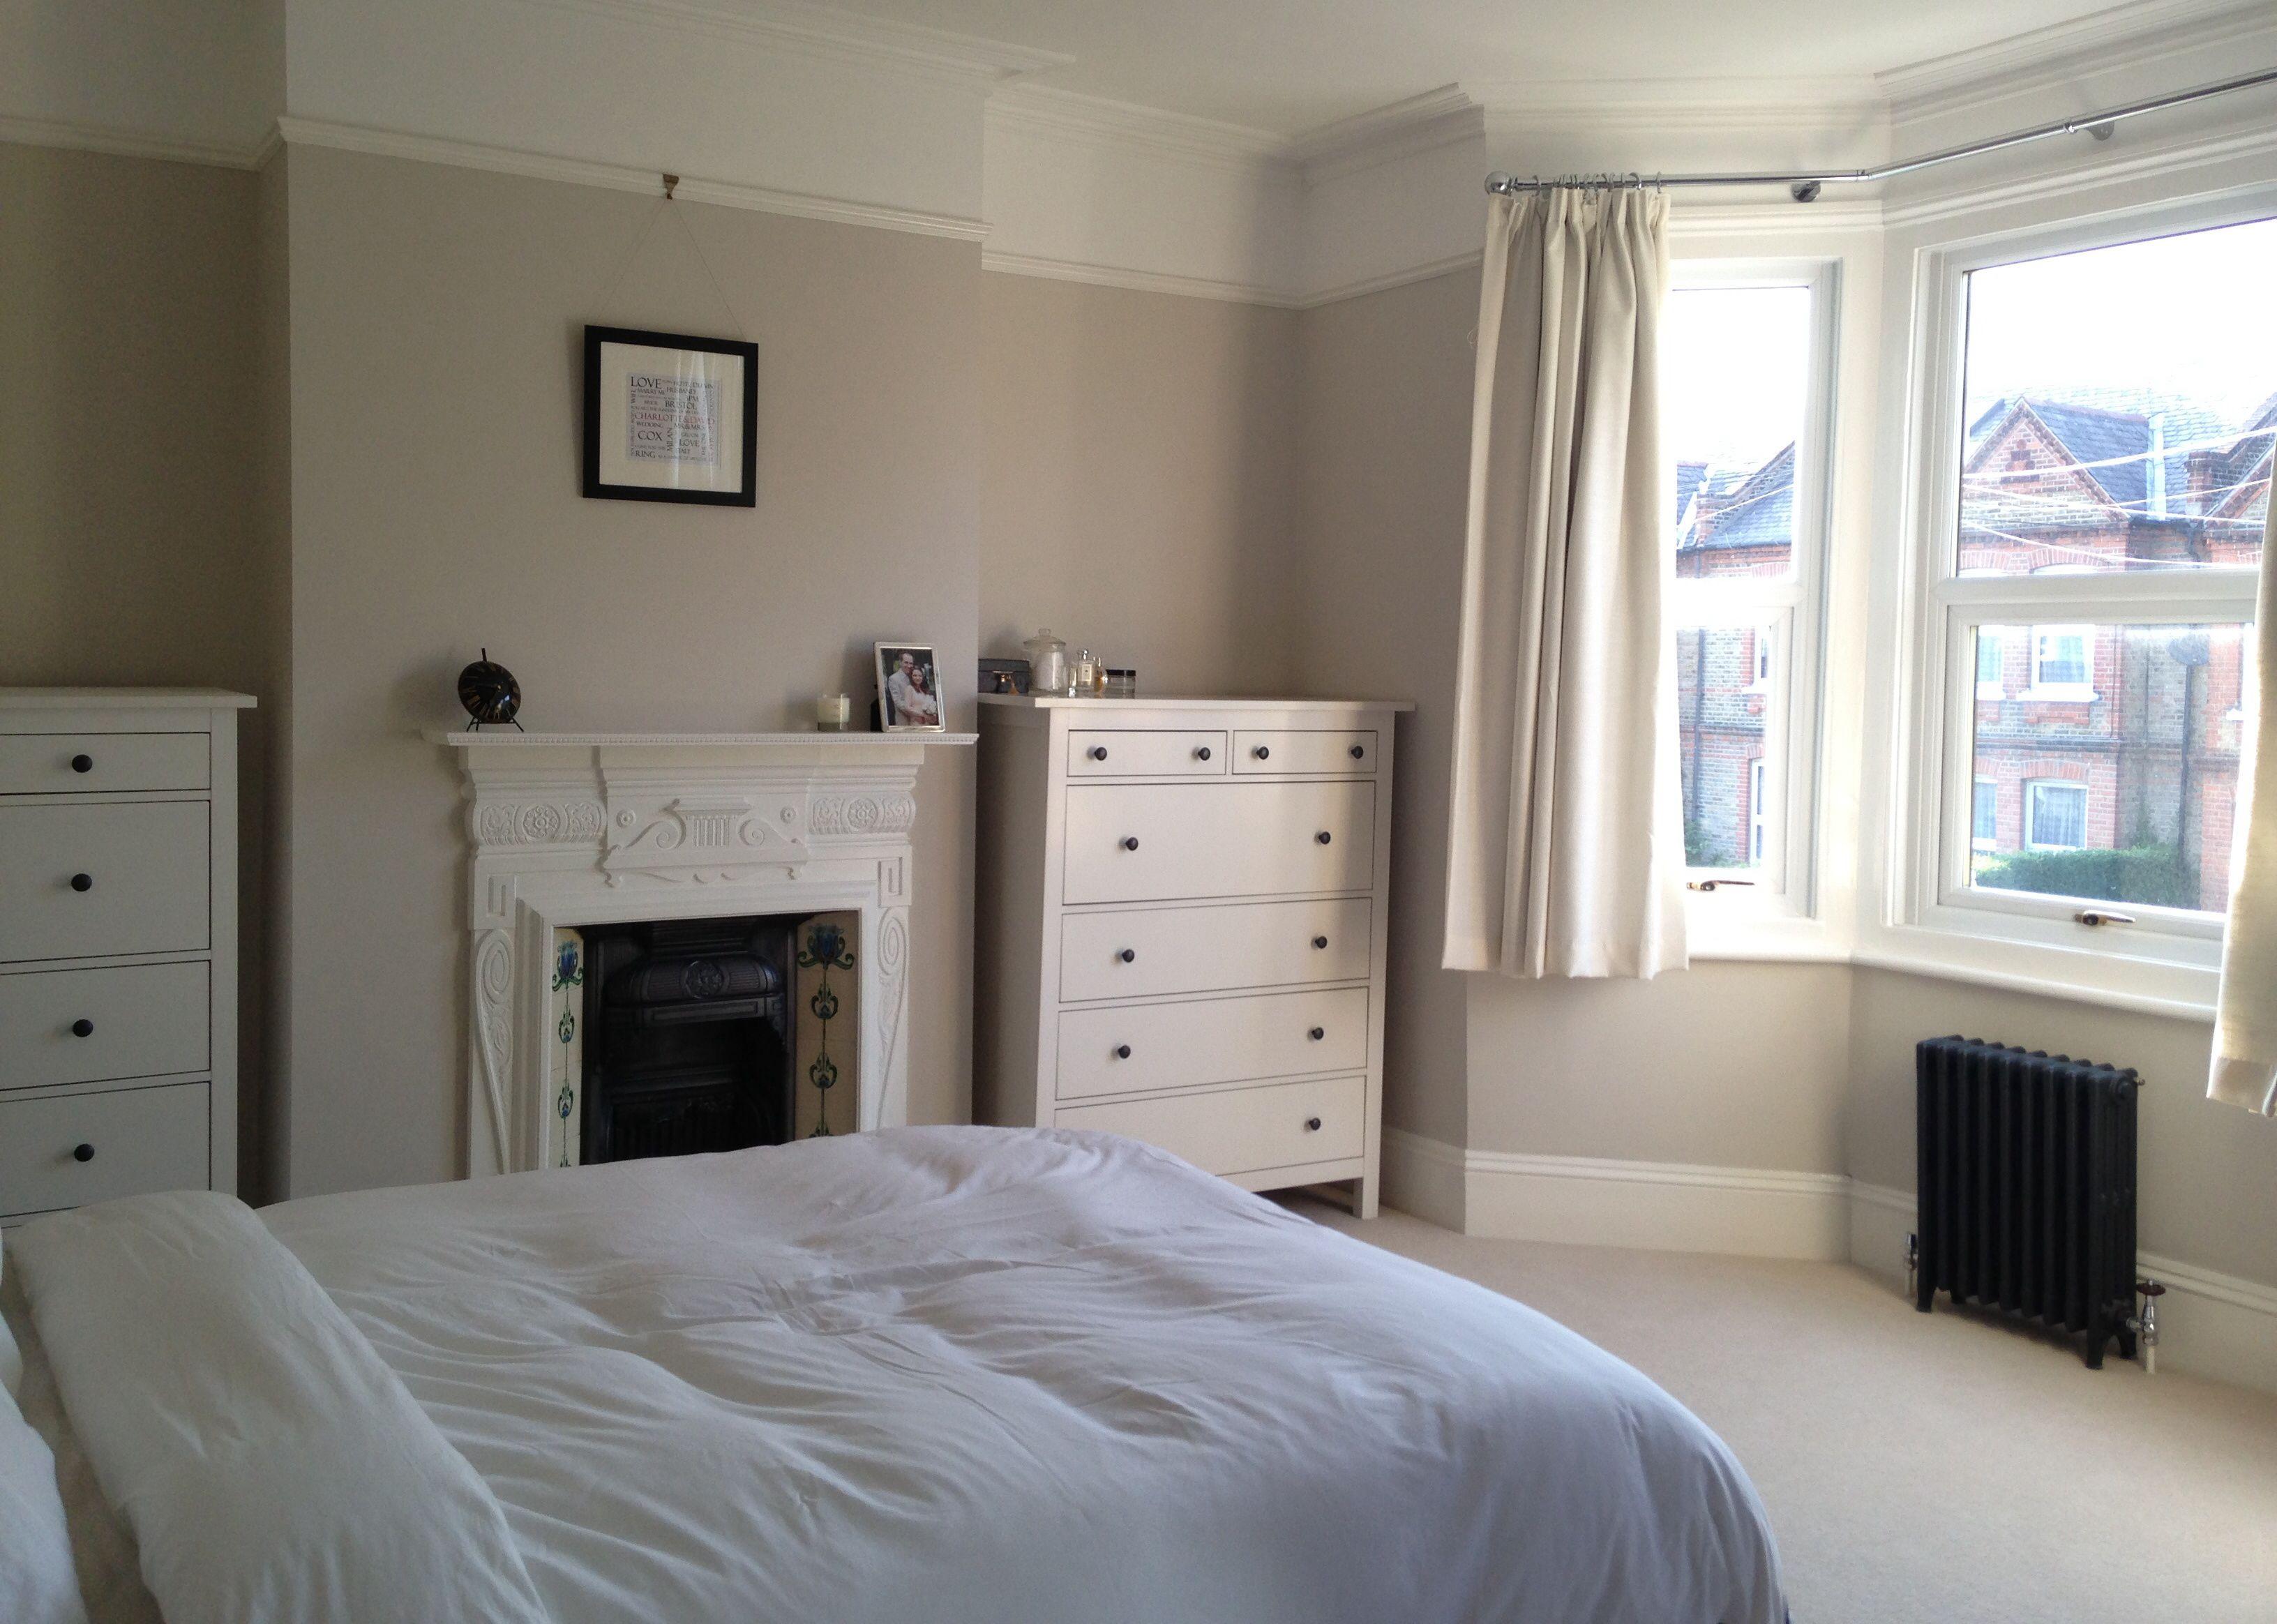 Dulux Zestaw Bedroom In A Box: Homebase Dulux Natural Hessian Matt Emulsion Paint In 2019